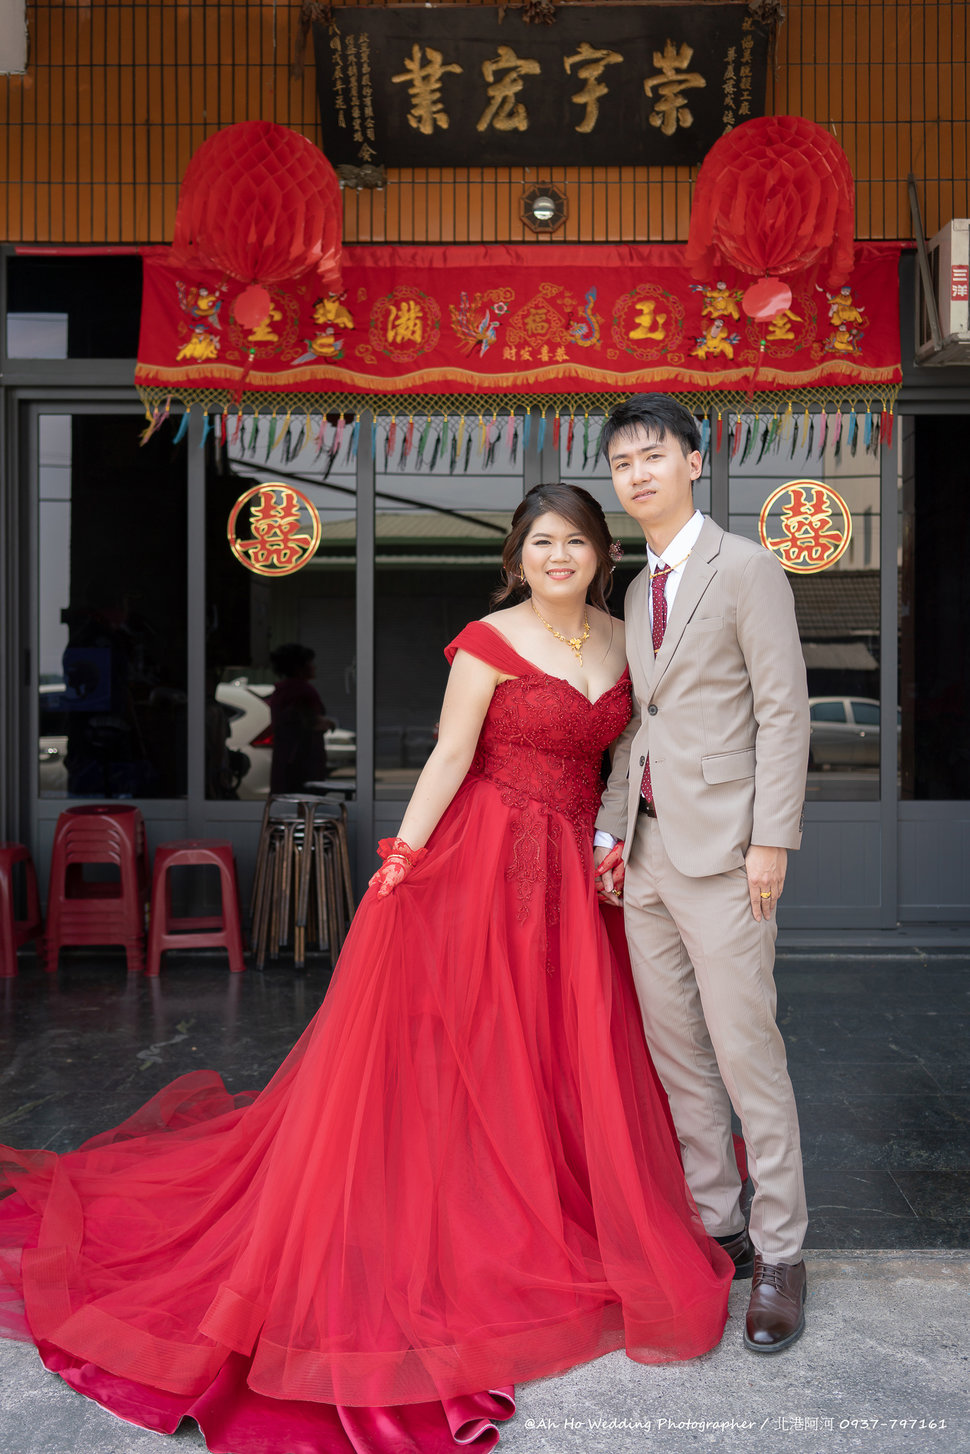 AhHo Wedding TEL-0937797161 lineID-chiupeiho-198 - 北港阿河婚攝 AhHoWedding - 結婚吧